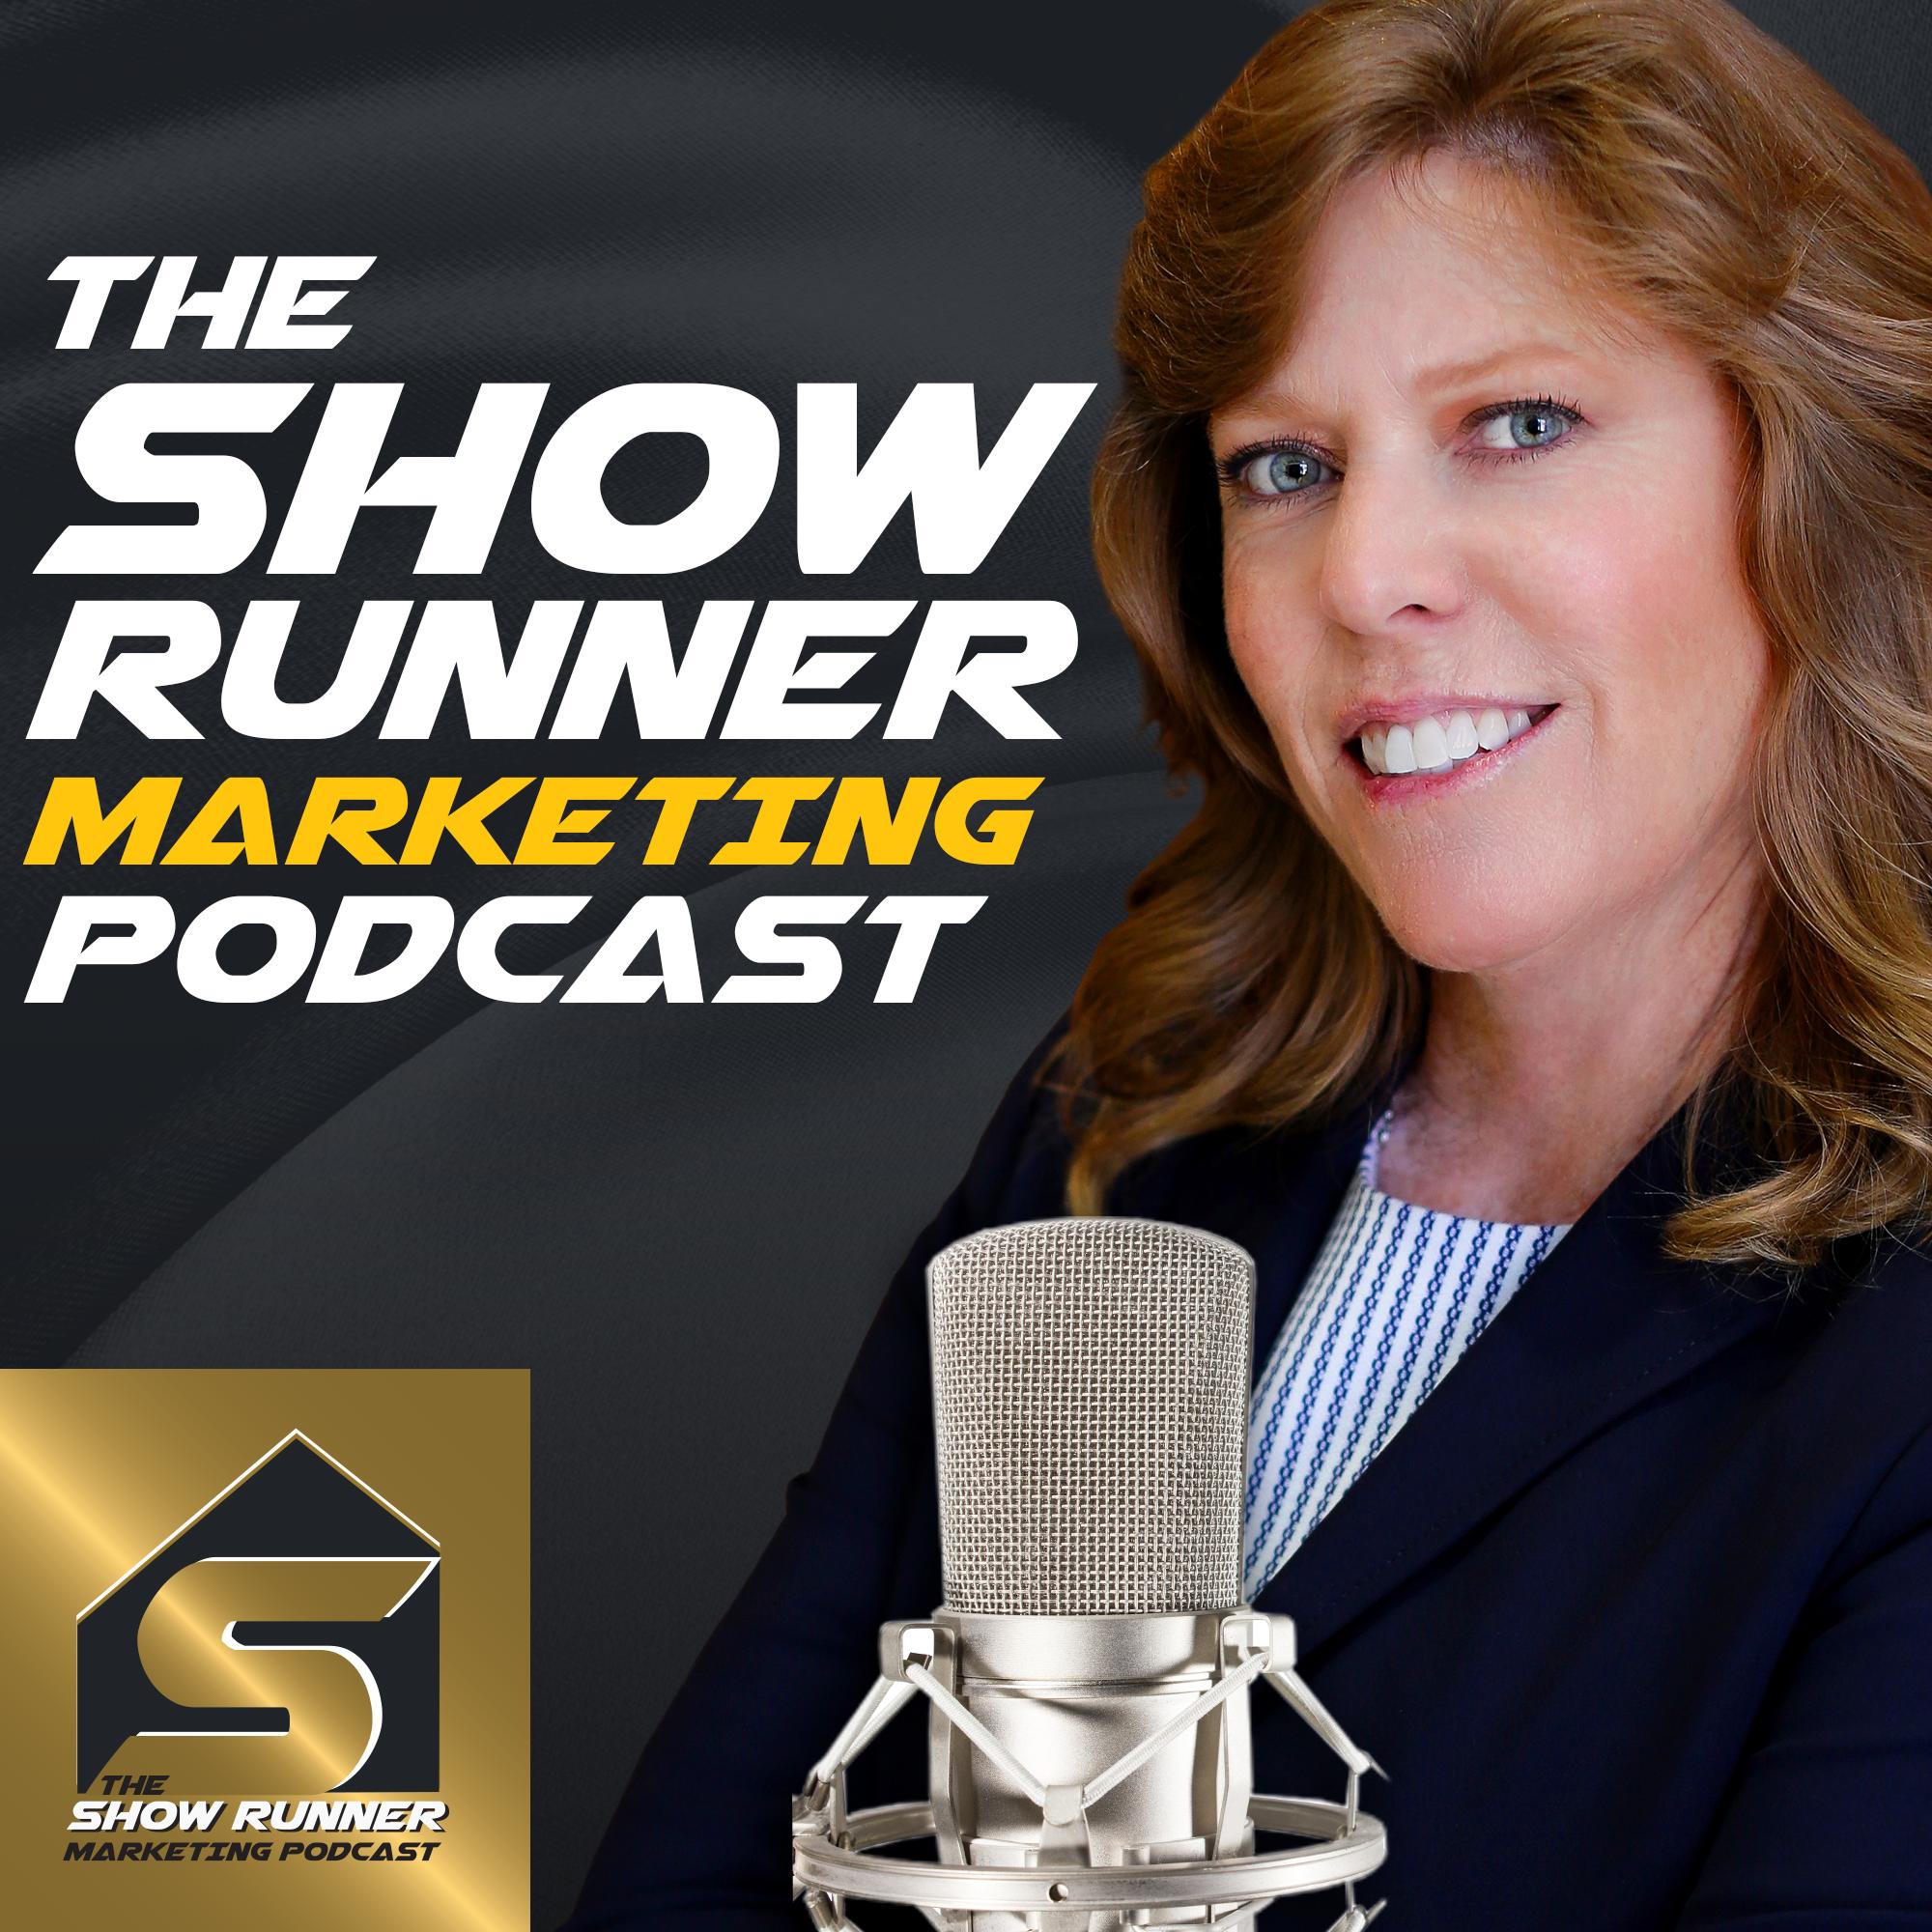 The Show Runner Marketing Podcast show art